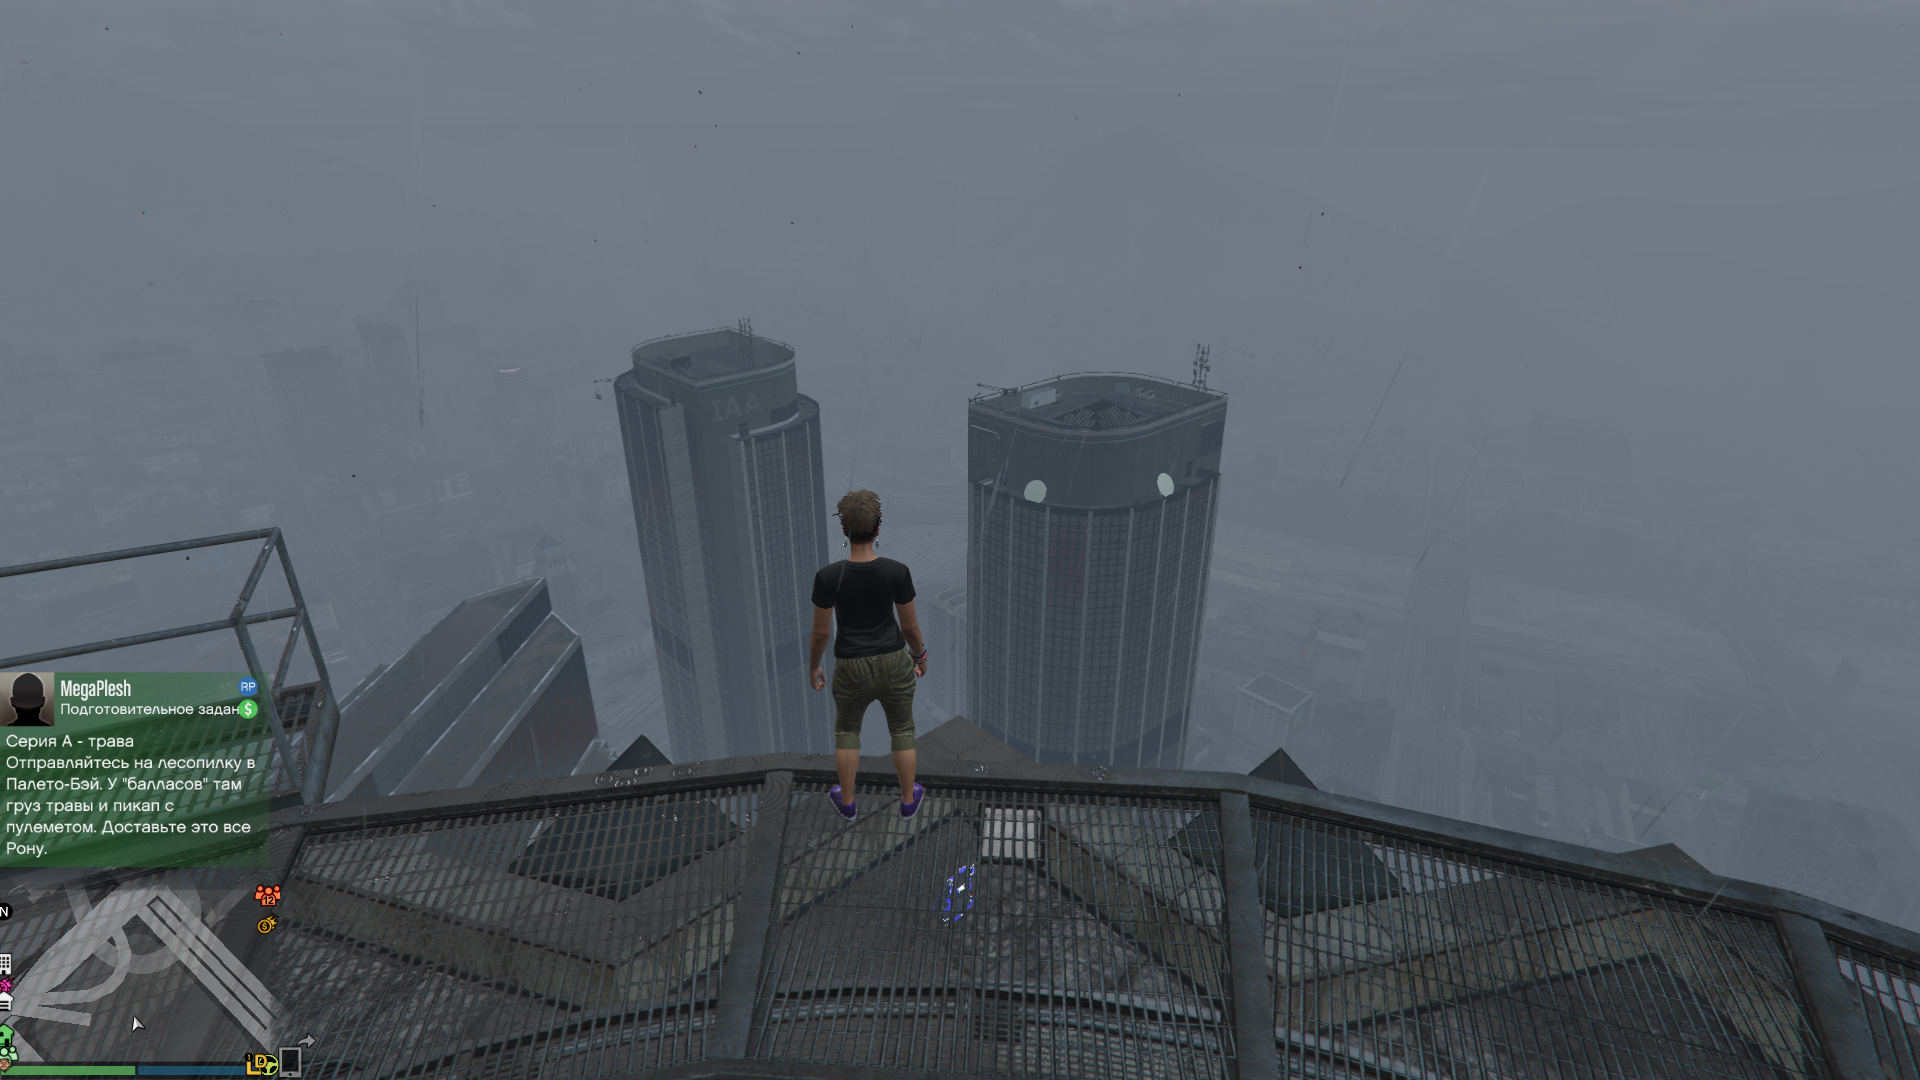 GTA5 2017-05-12 18-35-44-339.jpg - Grand Theft Auto 5 Приключения Красотки